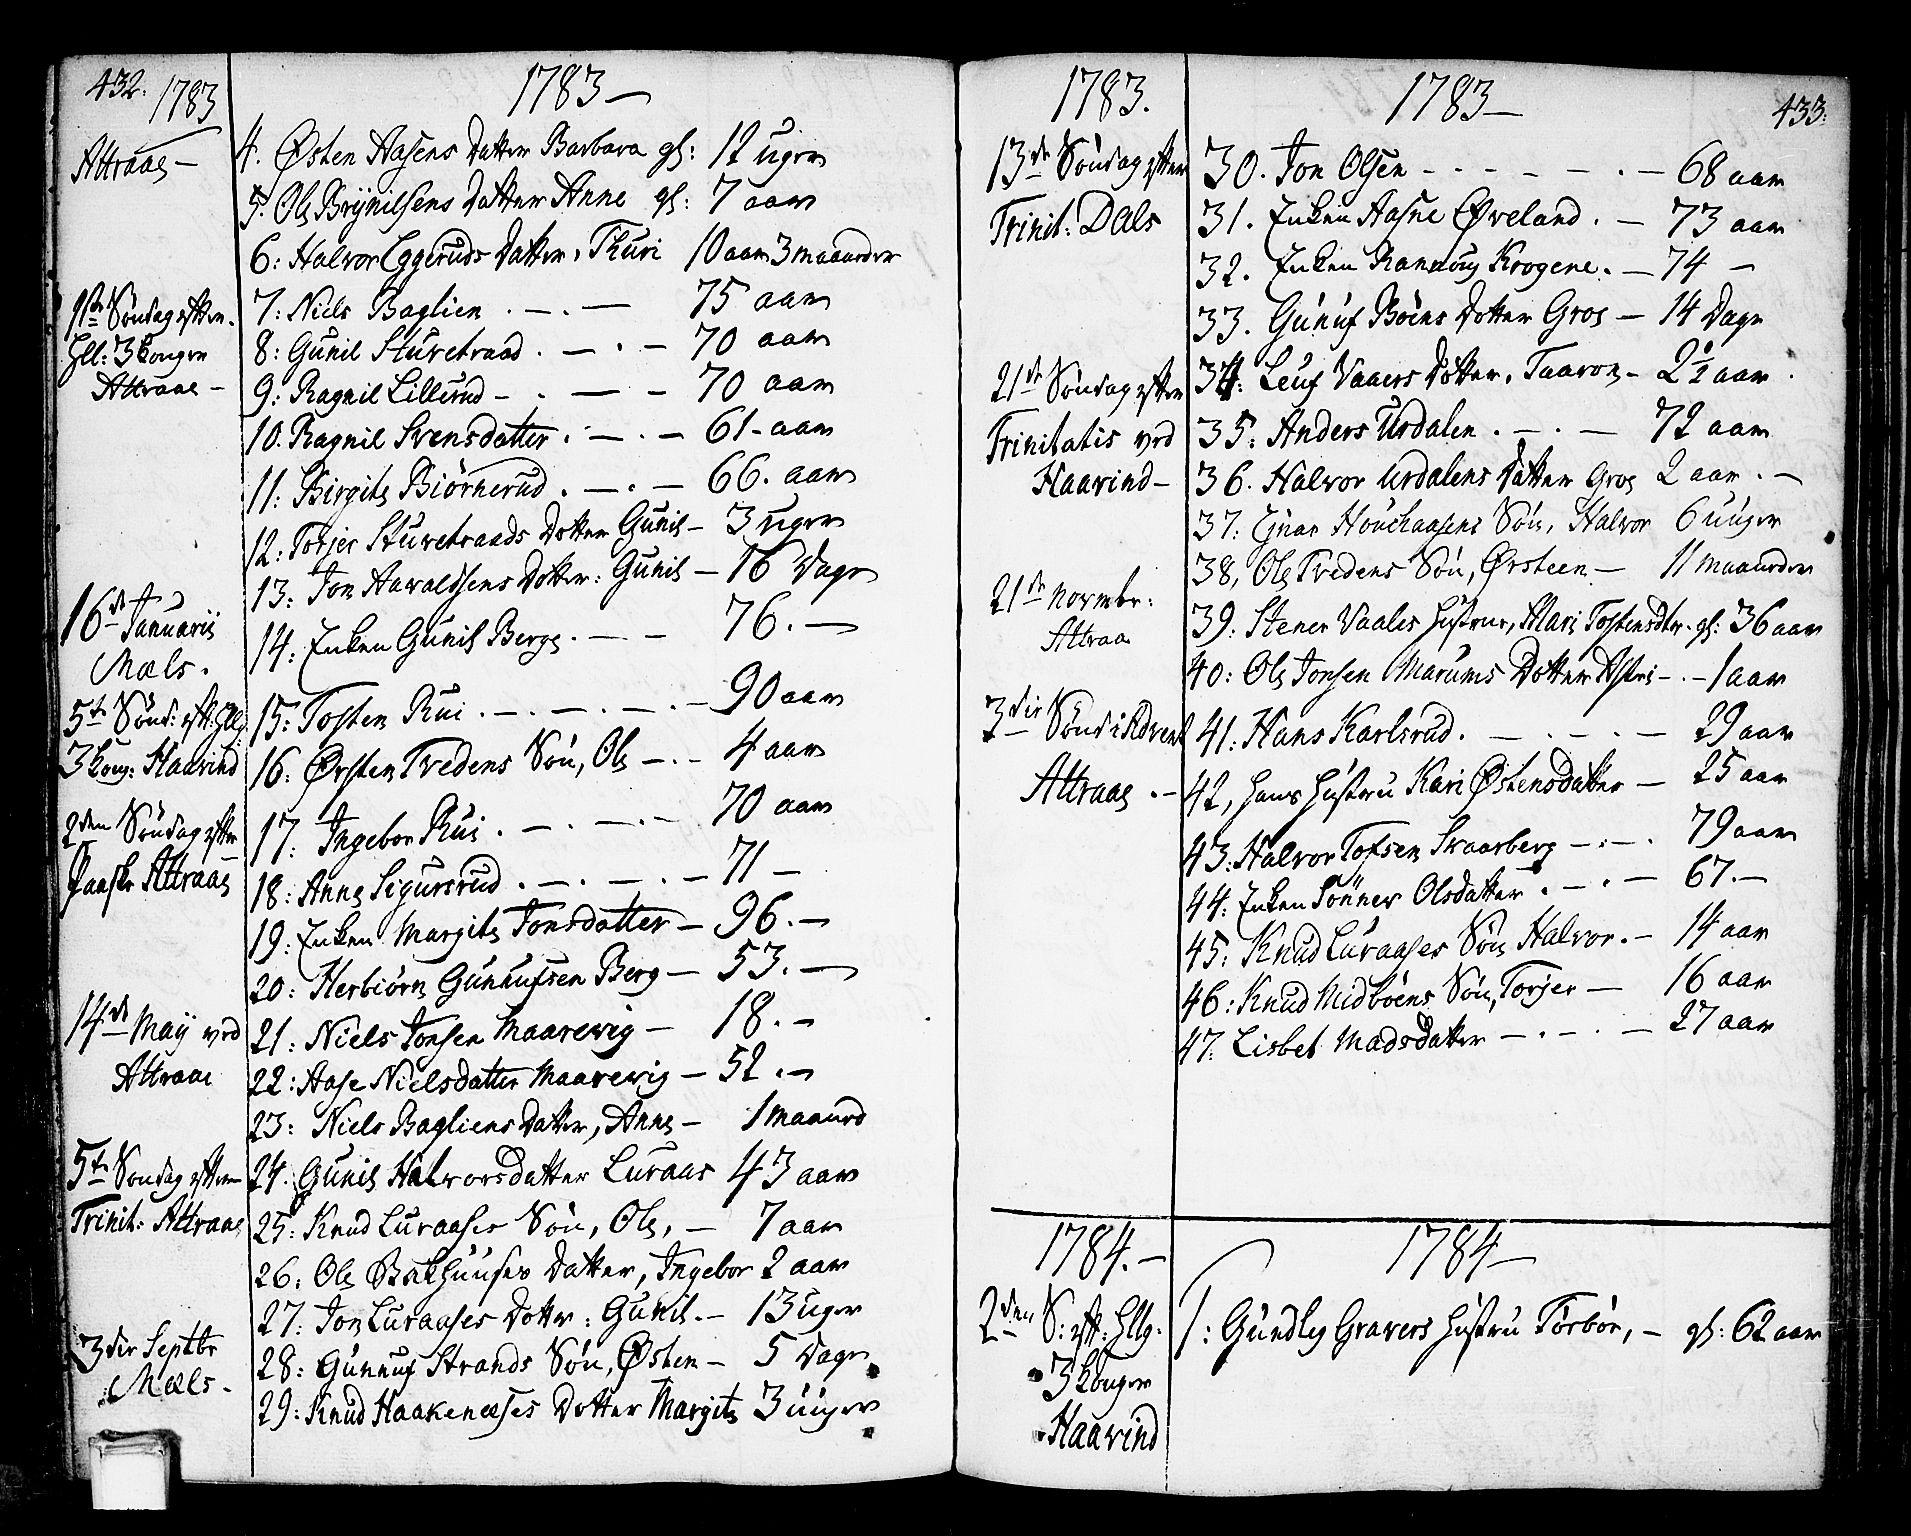 SAKO, Tinn kirkebøker, F/Fa/L0002: Ministerialbok nr. I 2, 1757-1810, s. 432-433